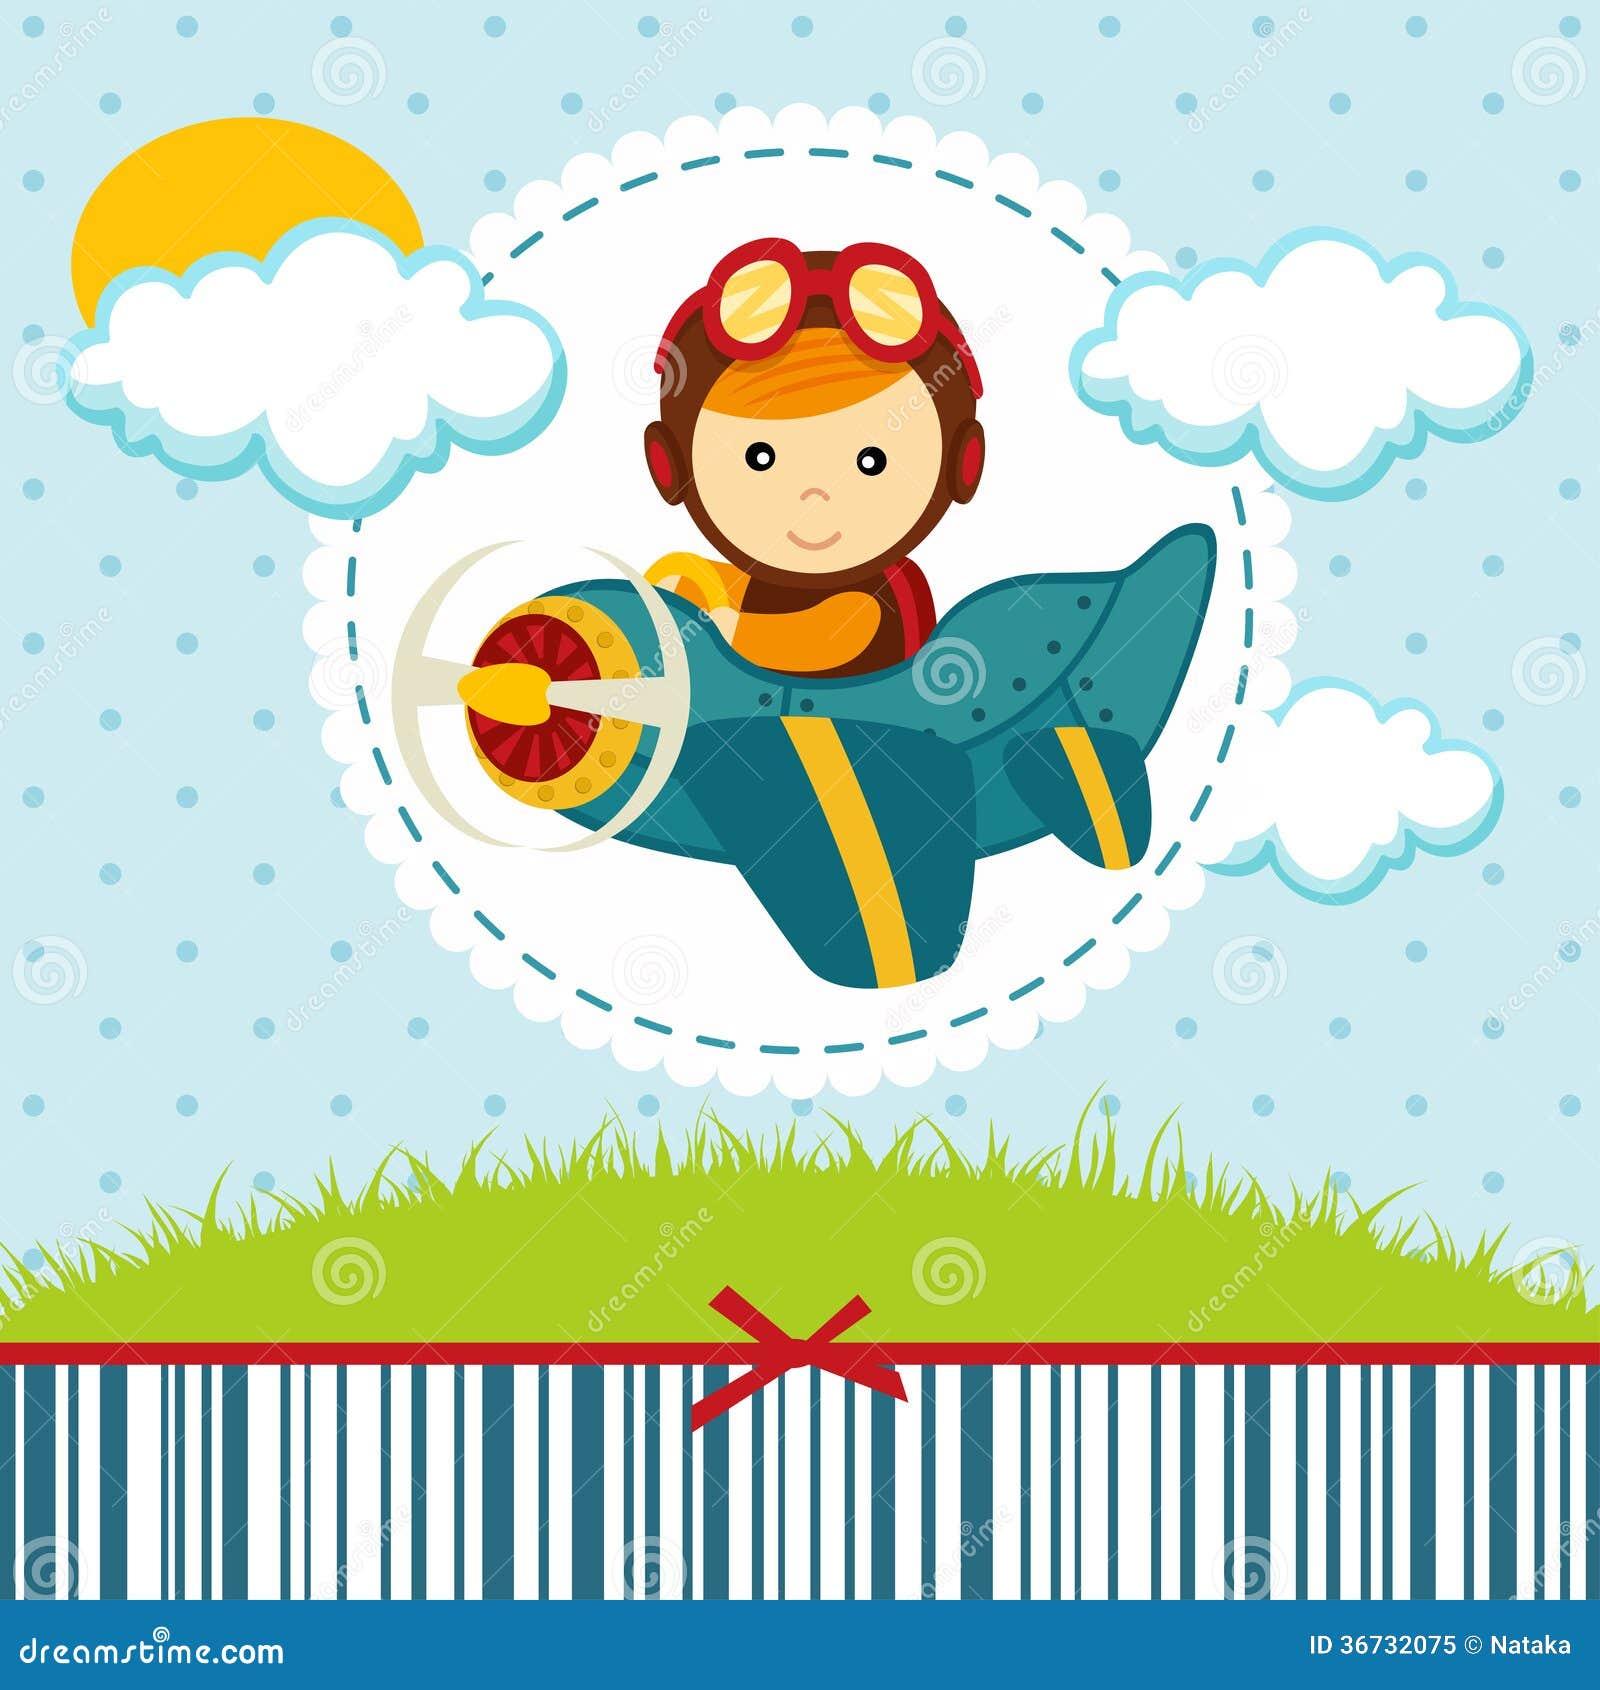 Baby Boy Pilot Royalty Free Stock Photo Image 36732075